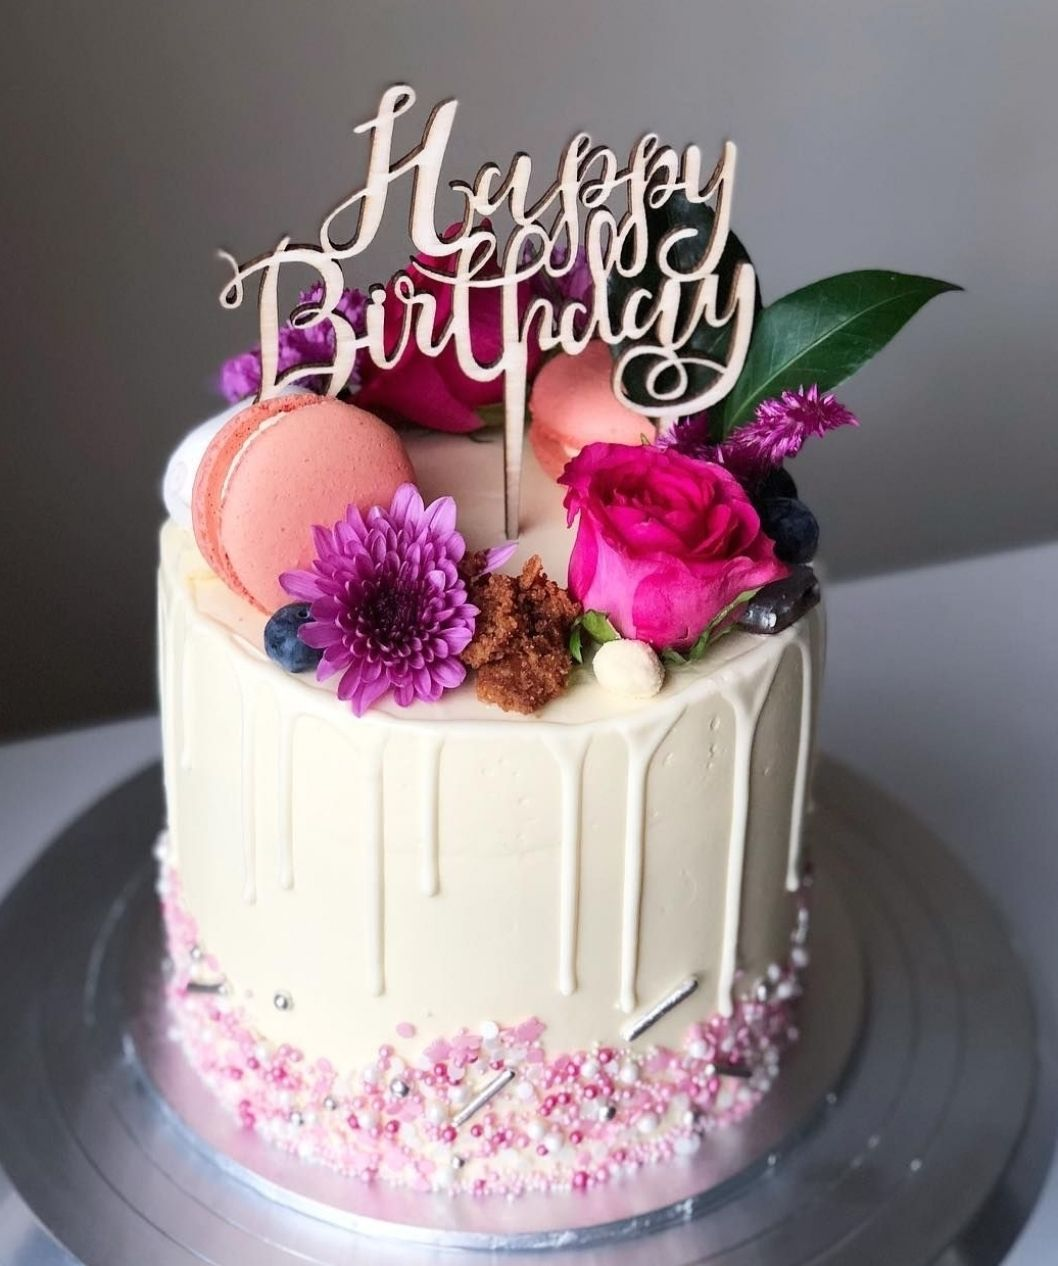 The Dessert Jar S Instagram Post She Leaves Behind A Little Sparkle Wherever Sh Happy Birthday Cupcakes Happy Birthday Cake Pictures Happy Birthday Cakes